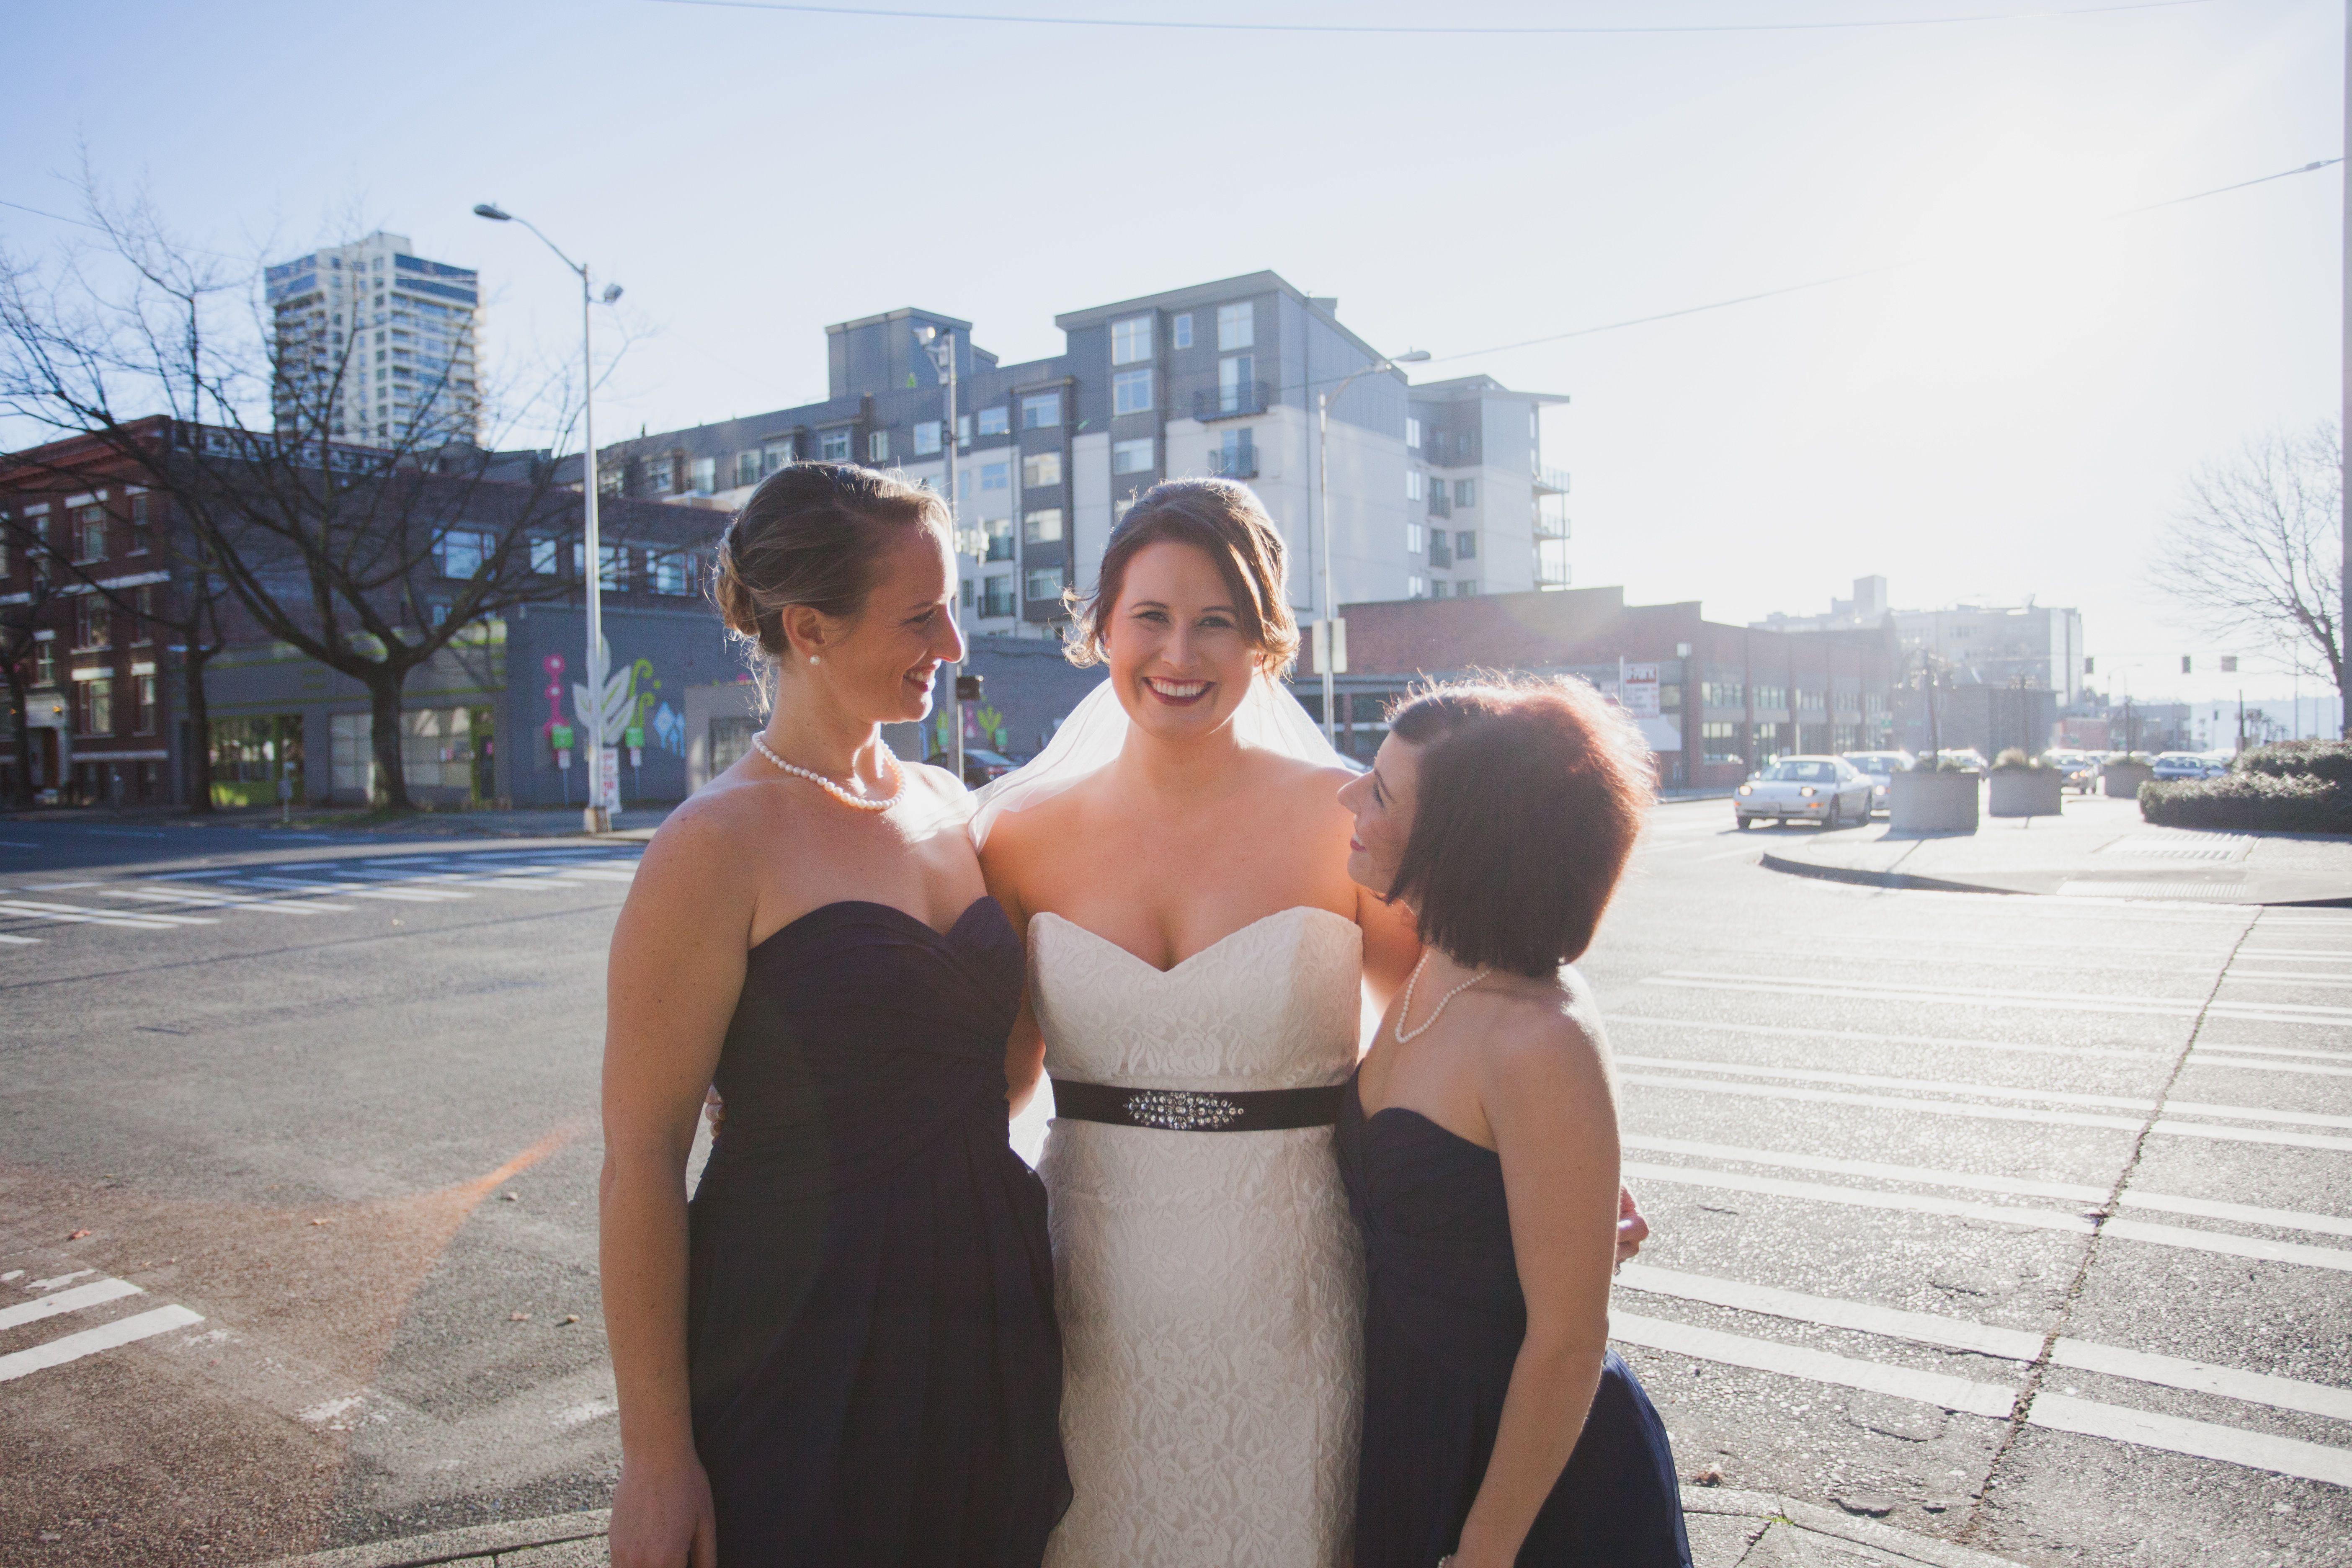 Nicole's girls. #urbanlightstudios #urbanlightsstudiosphotography #greenwood #seattleweddings